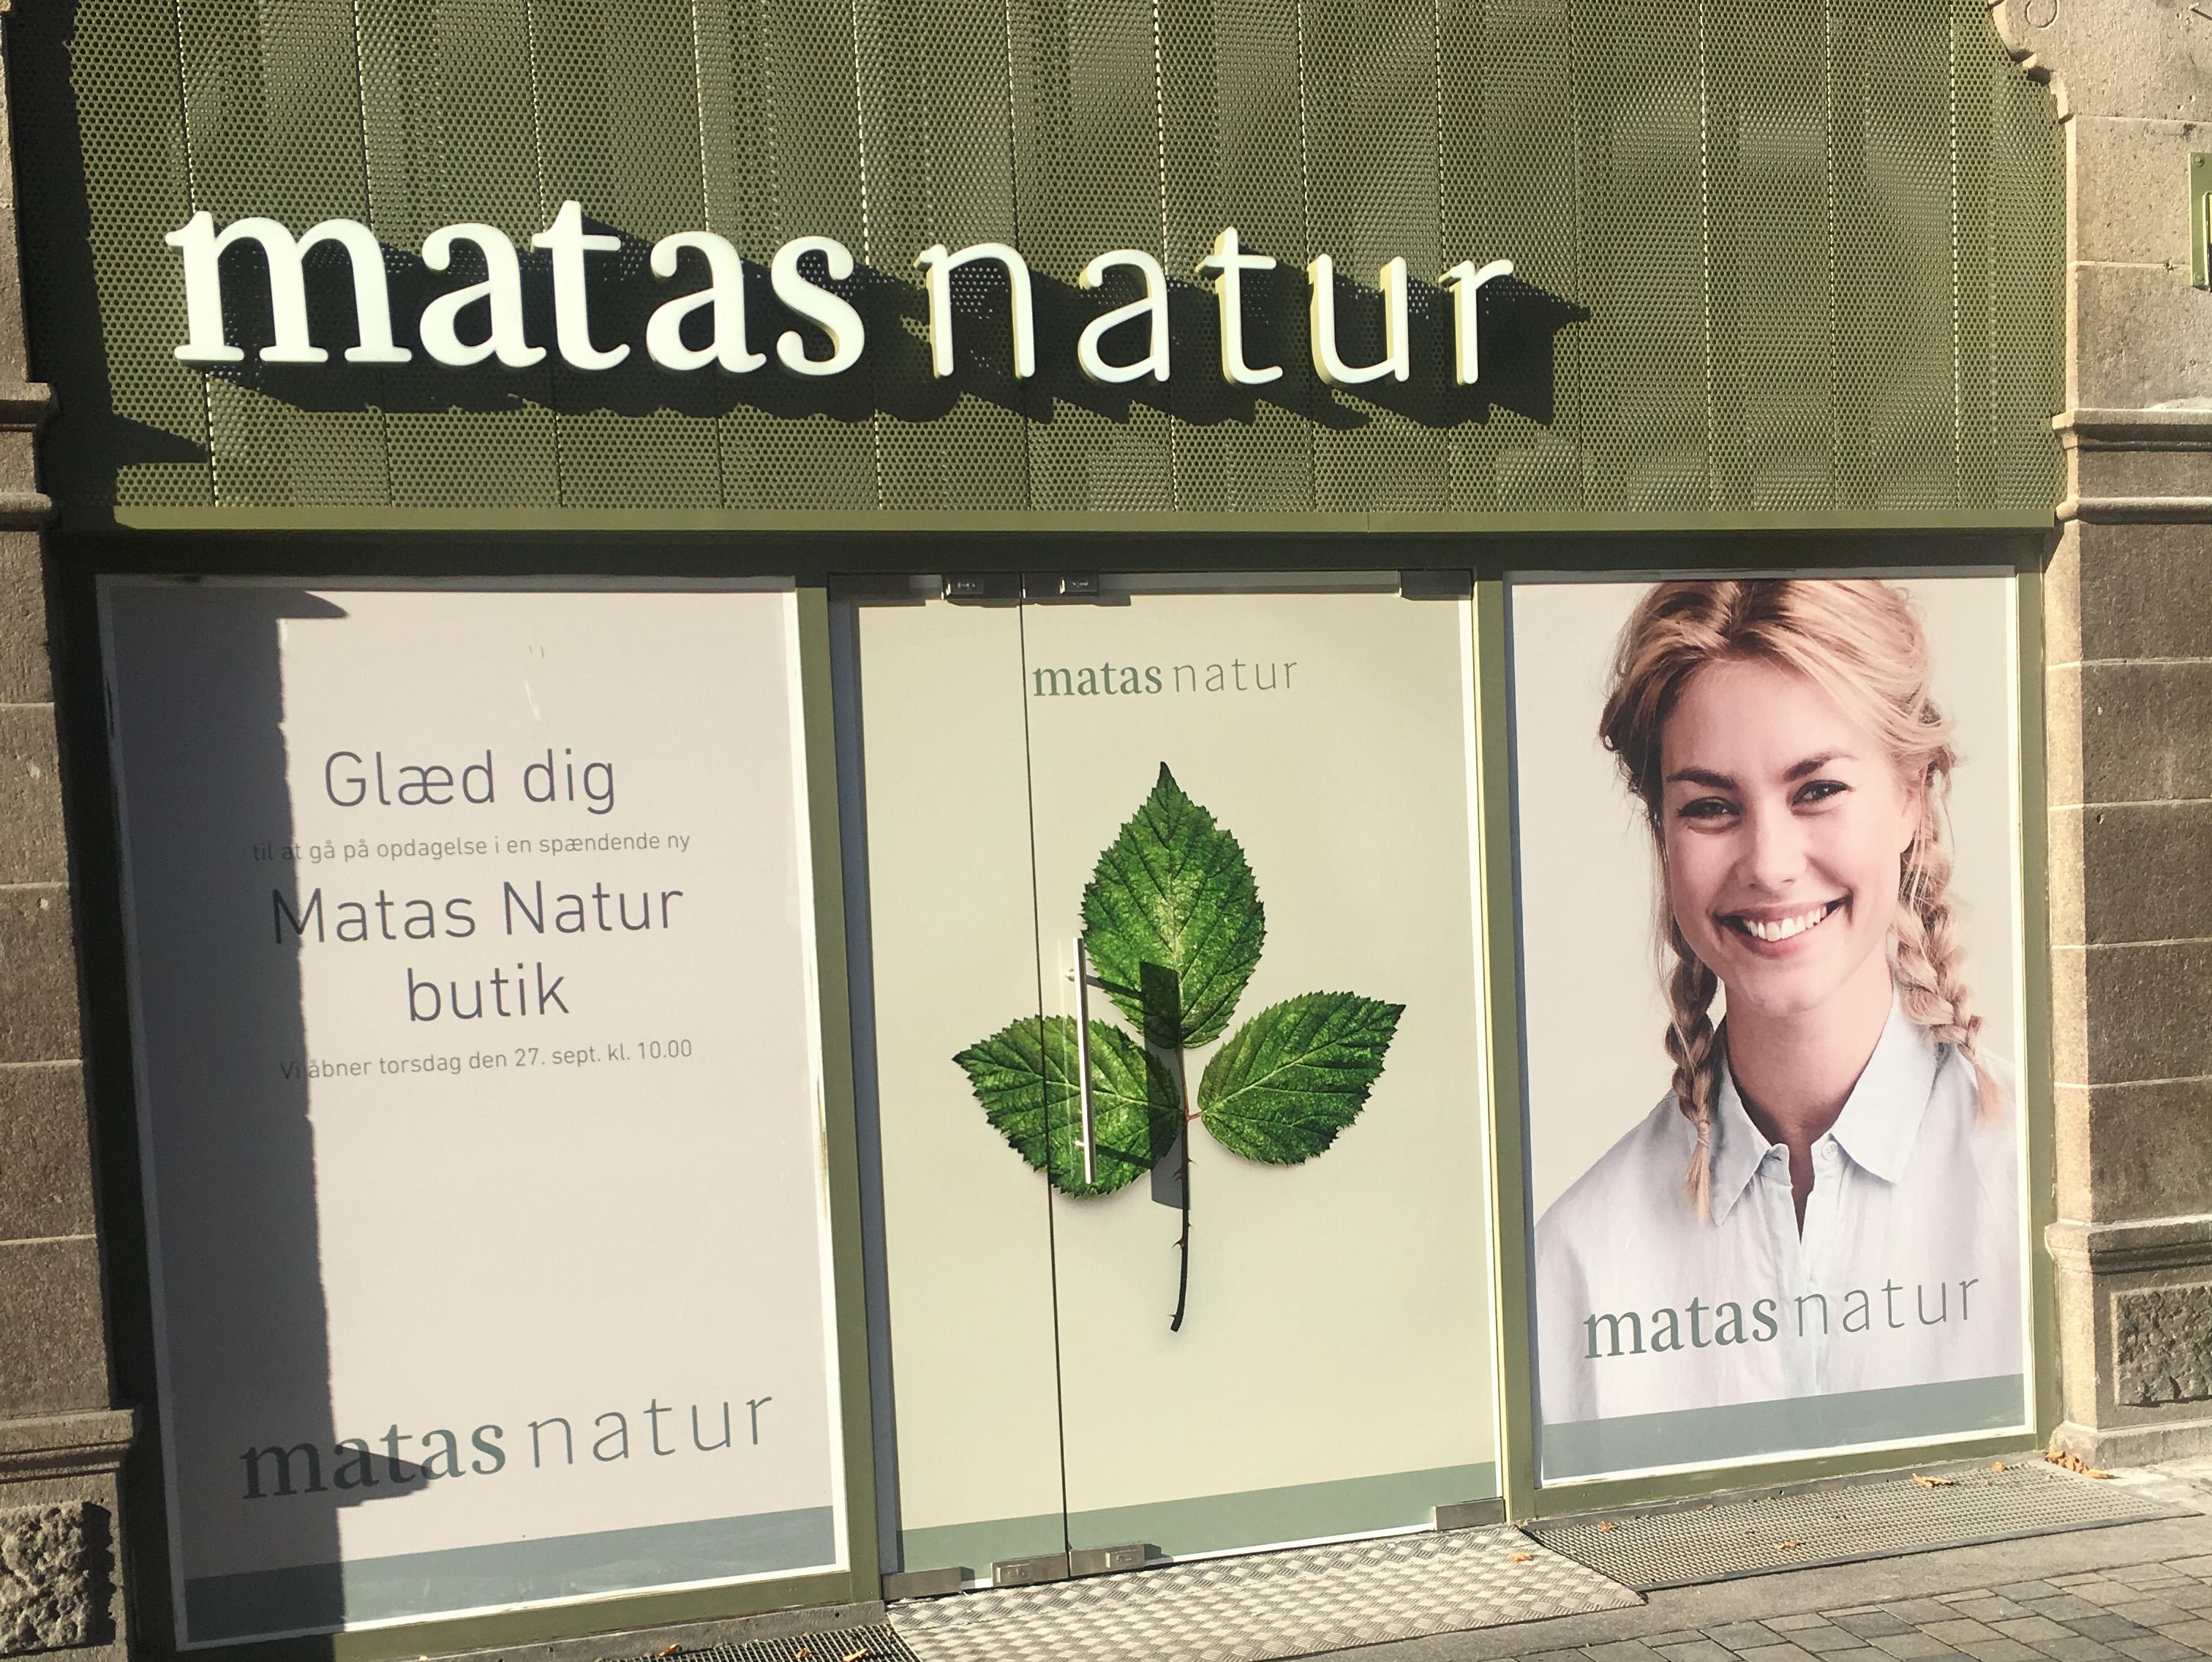 a2c78a60b3b4 Matas åbner dørene for nyt grønt koncept - RetailNews